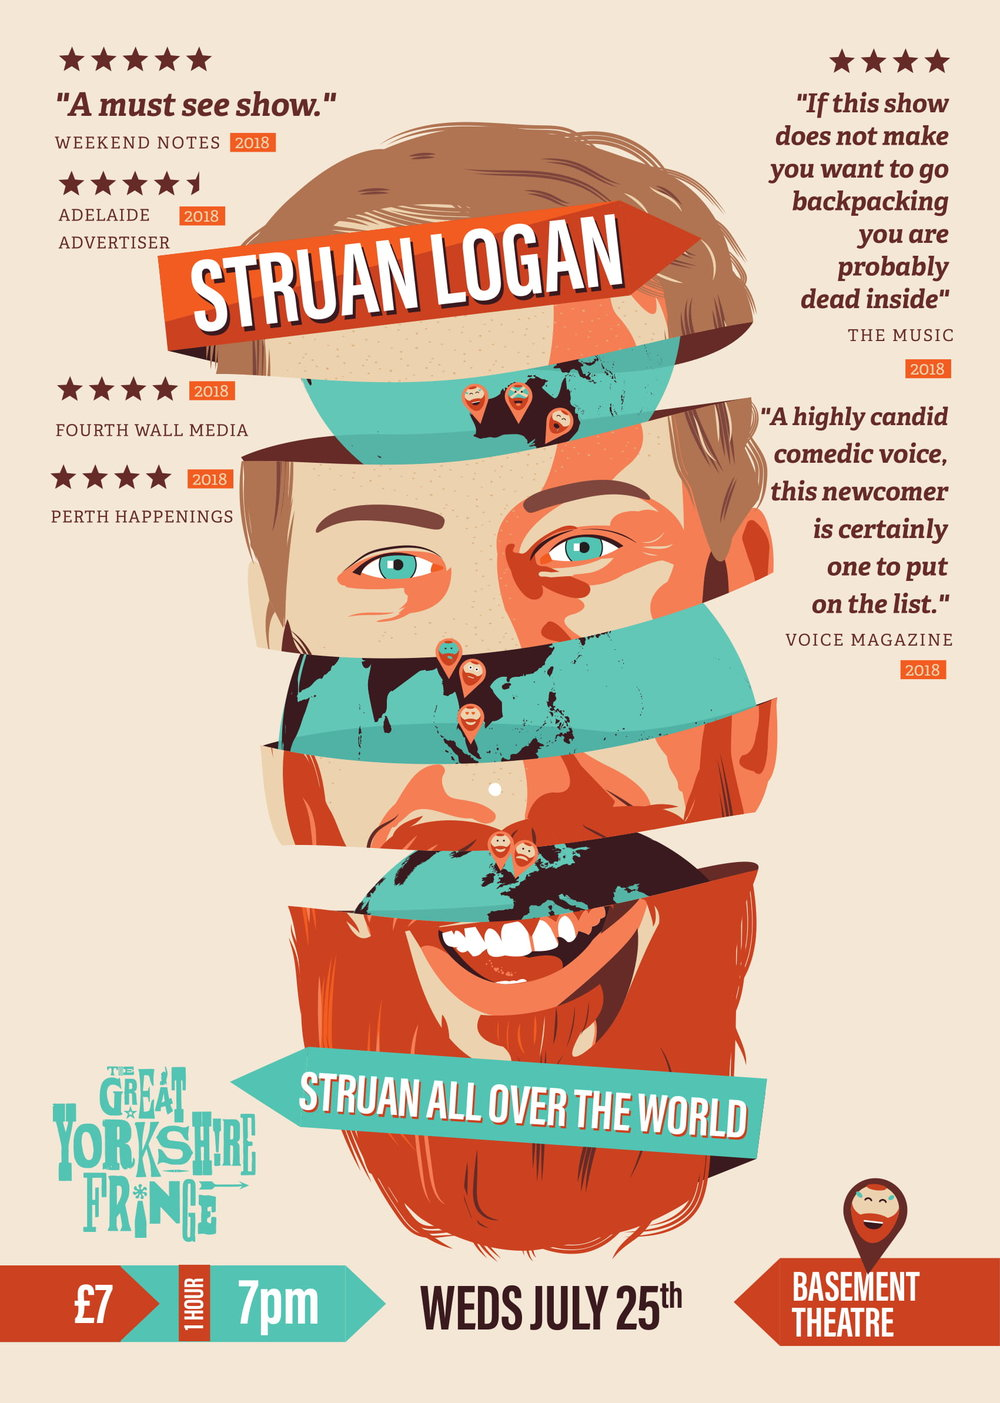 StruanLogan_Poster_GREATYORKSHIRE_A3-1.jpg